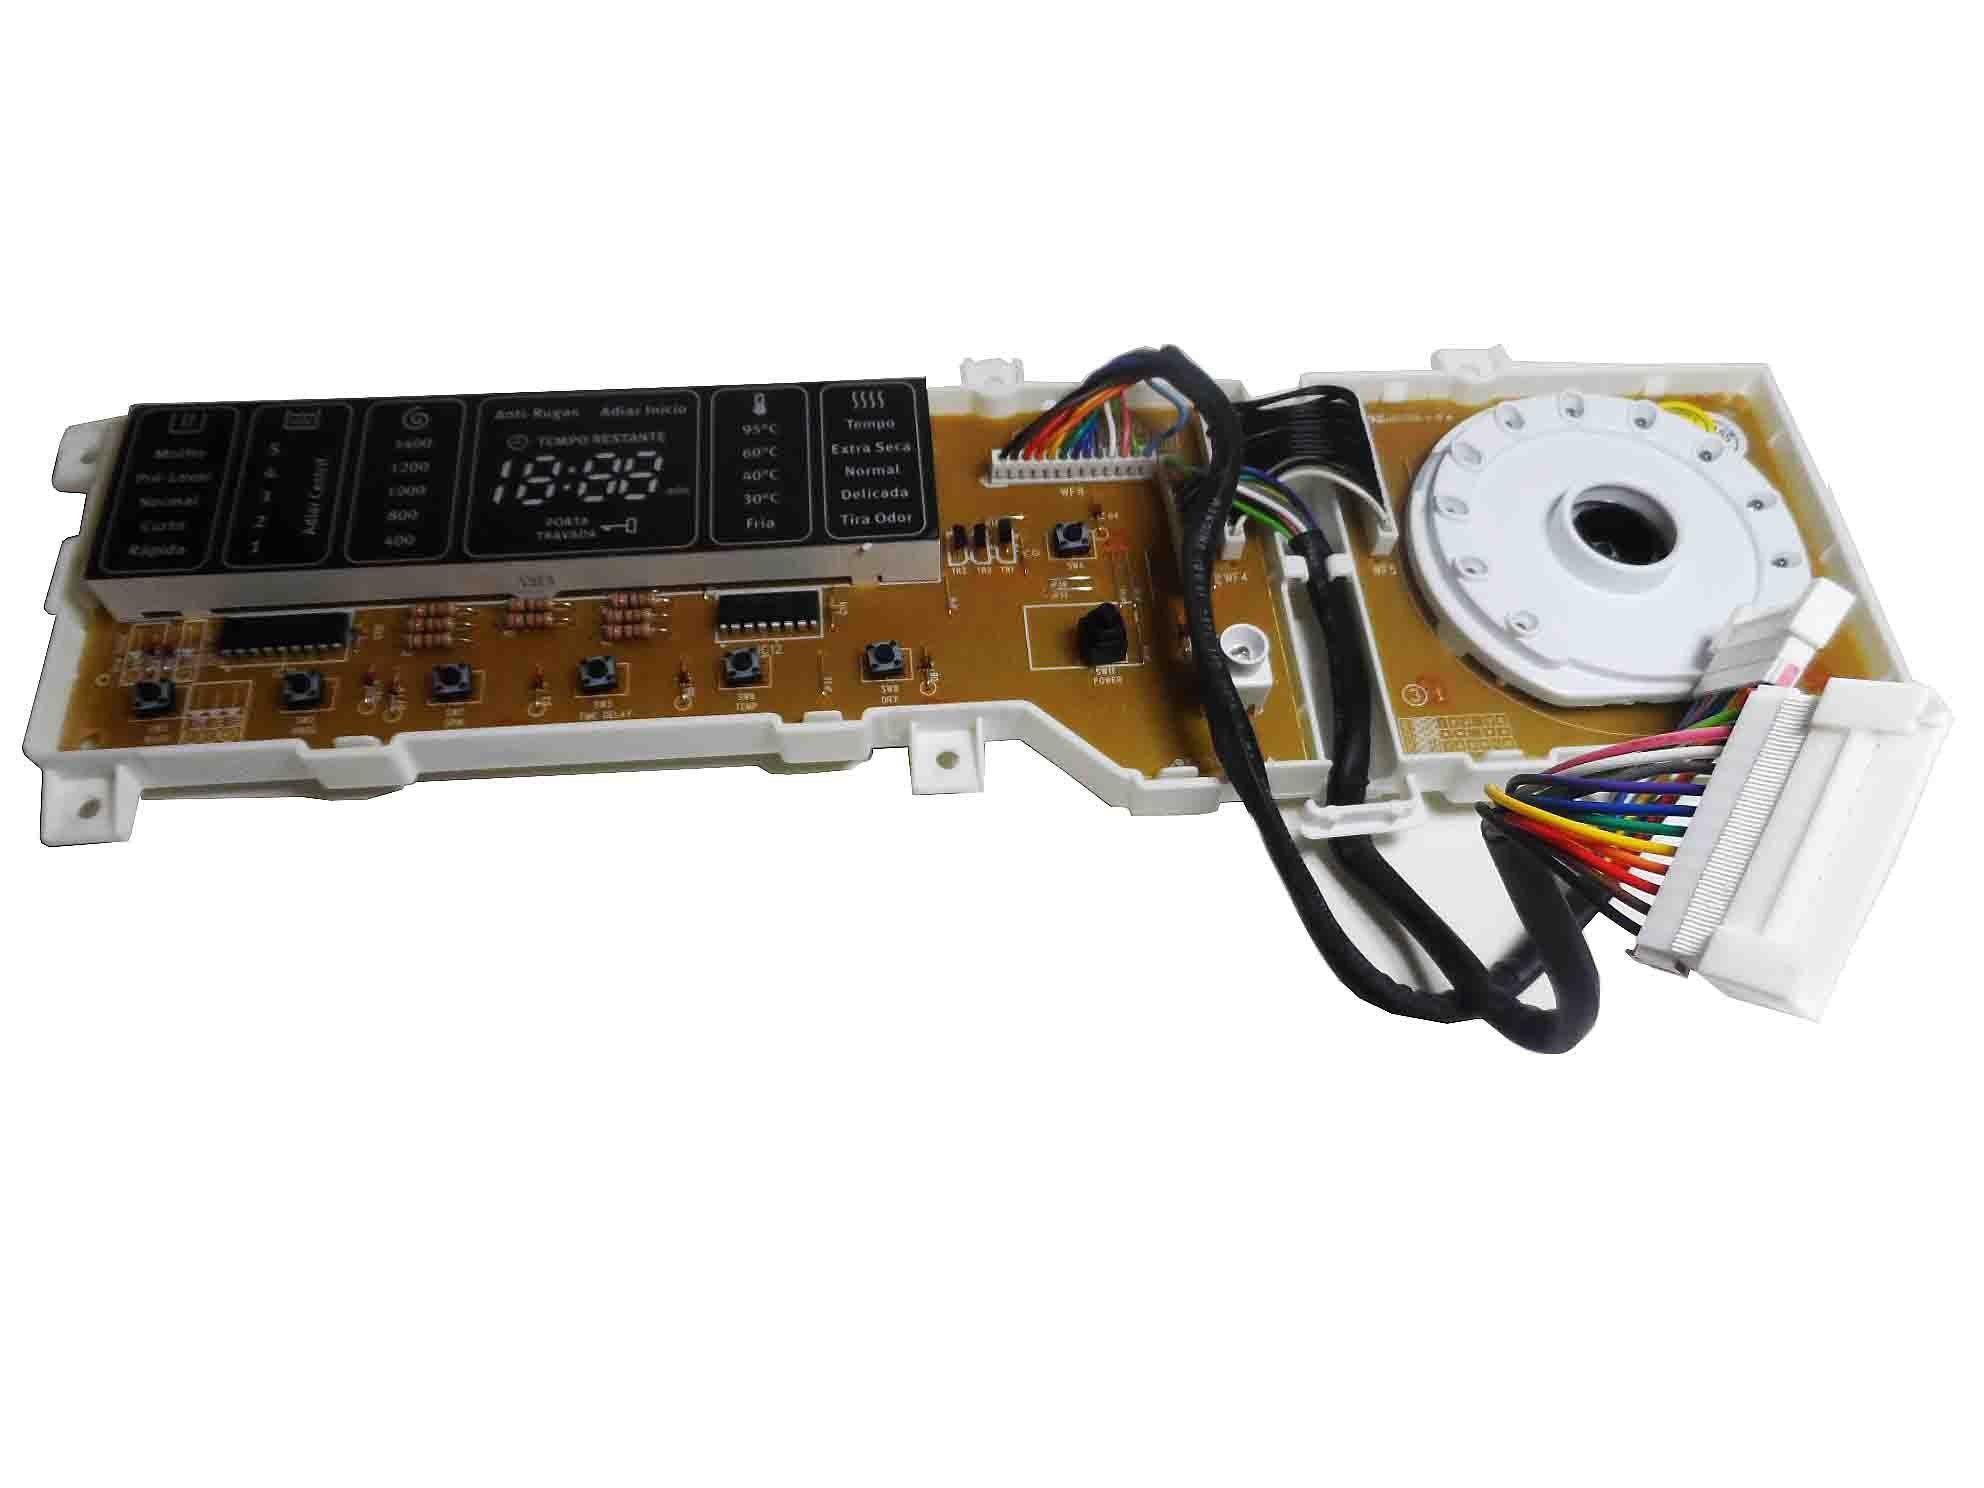 Placa Eletrônica Interface Lava Seca Electrolux 127V PRPSSWL076